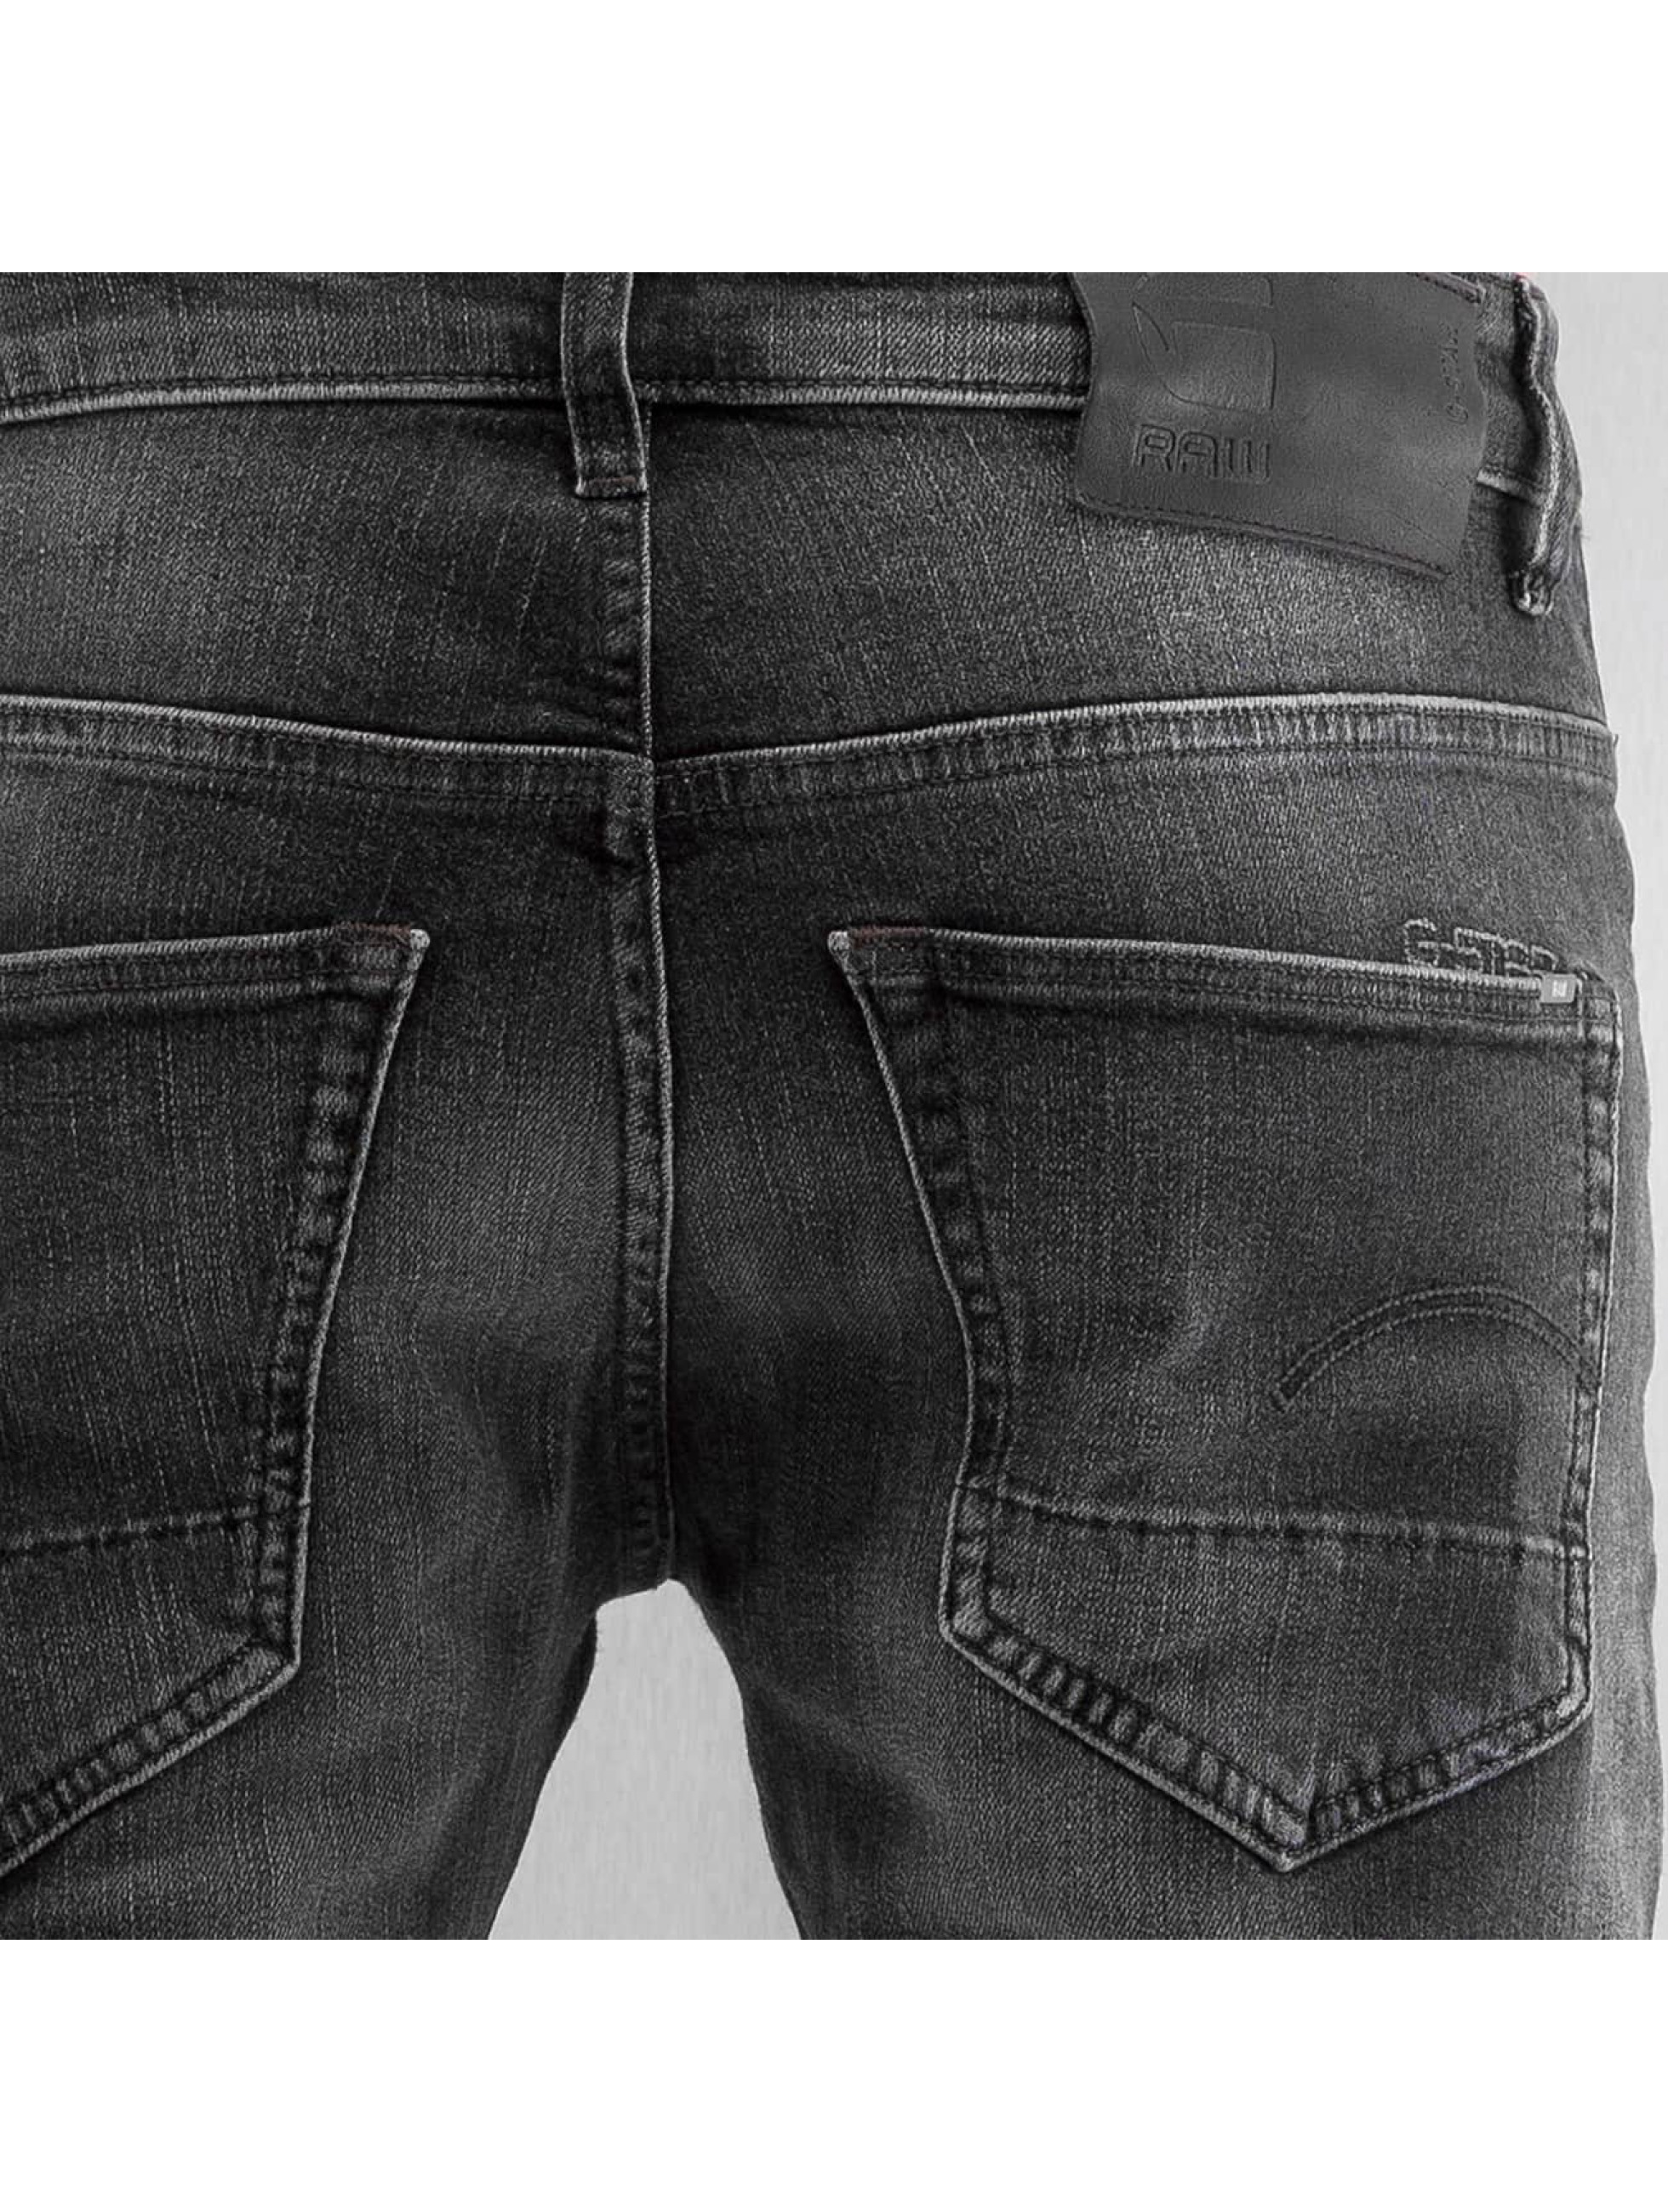 G-Star Skinny Jeans 3301 Slim Skop Black Strech Denim szary